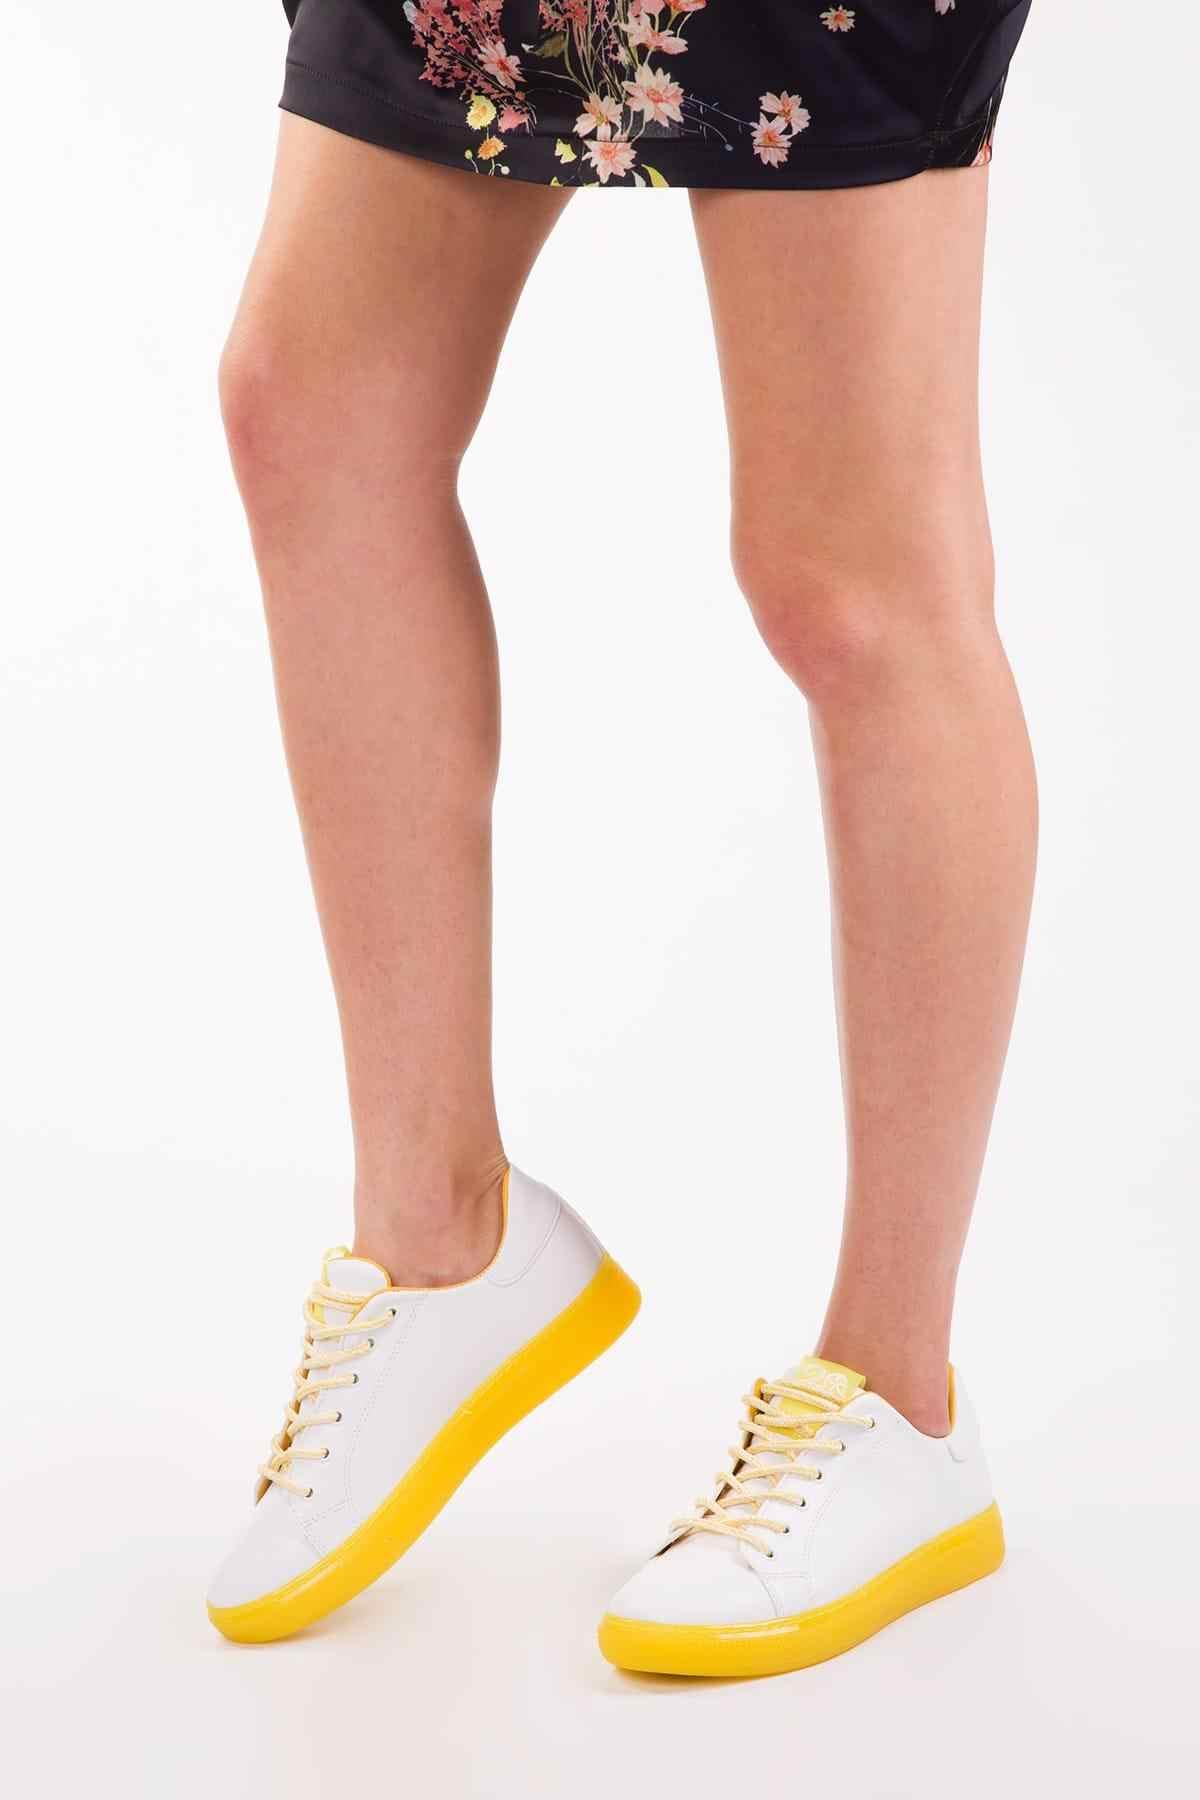 SOHO Casual Neon Yellow Platform Women Sneaker Fashion Lace-up Flat Vulcanized Sports Shoes 12919